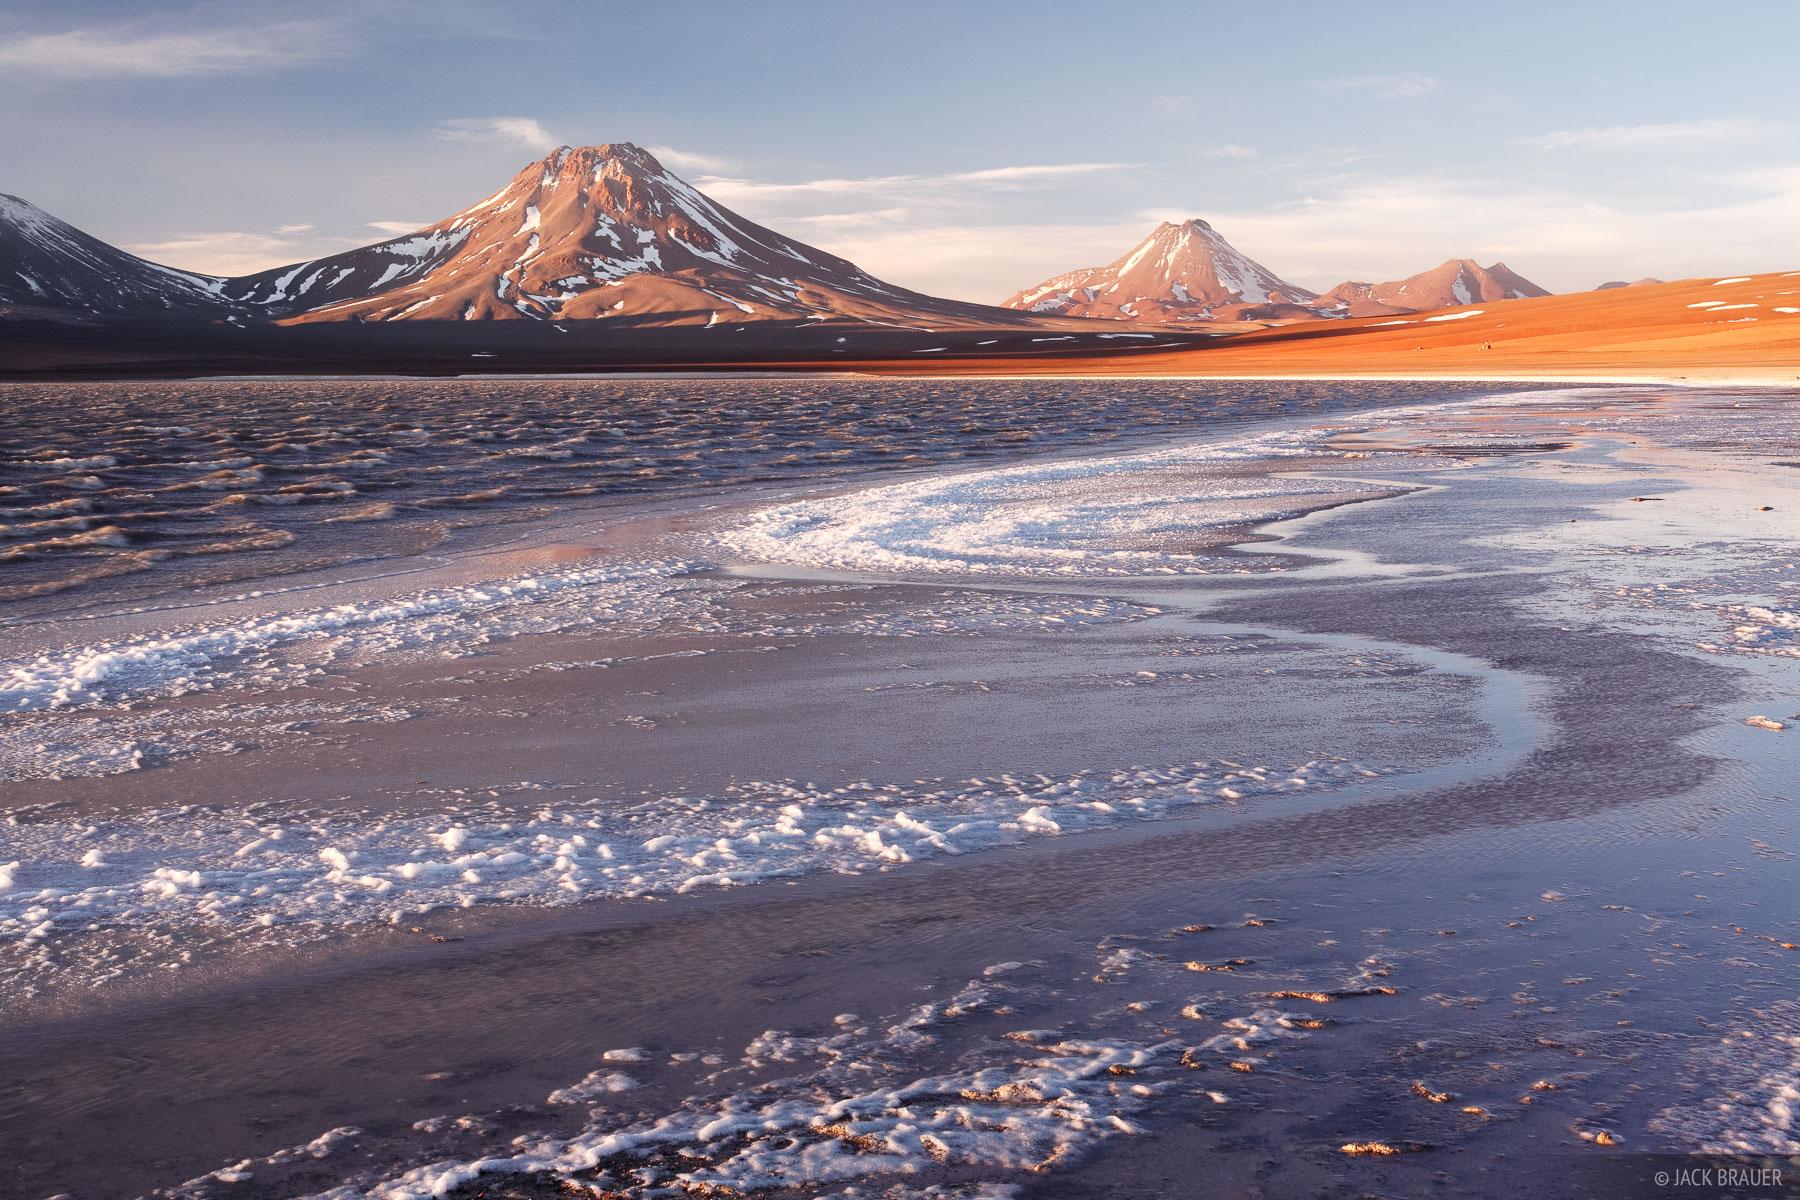 Laguna Lejia, Chile, sunset, Volcán Simba, Cerro Acamarachi, photo